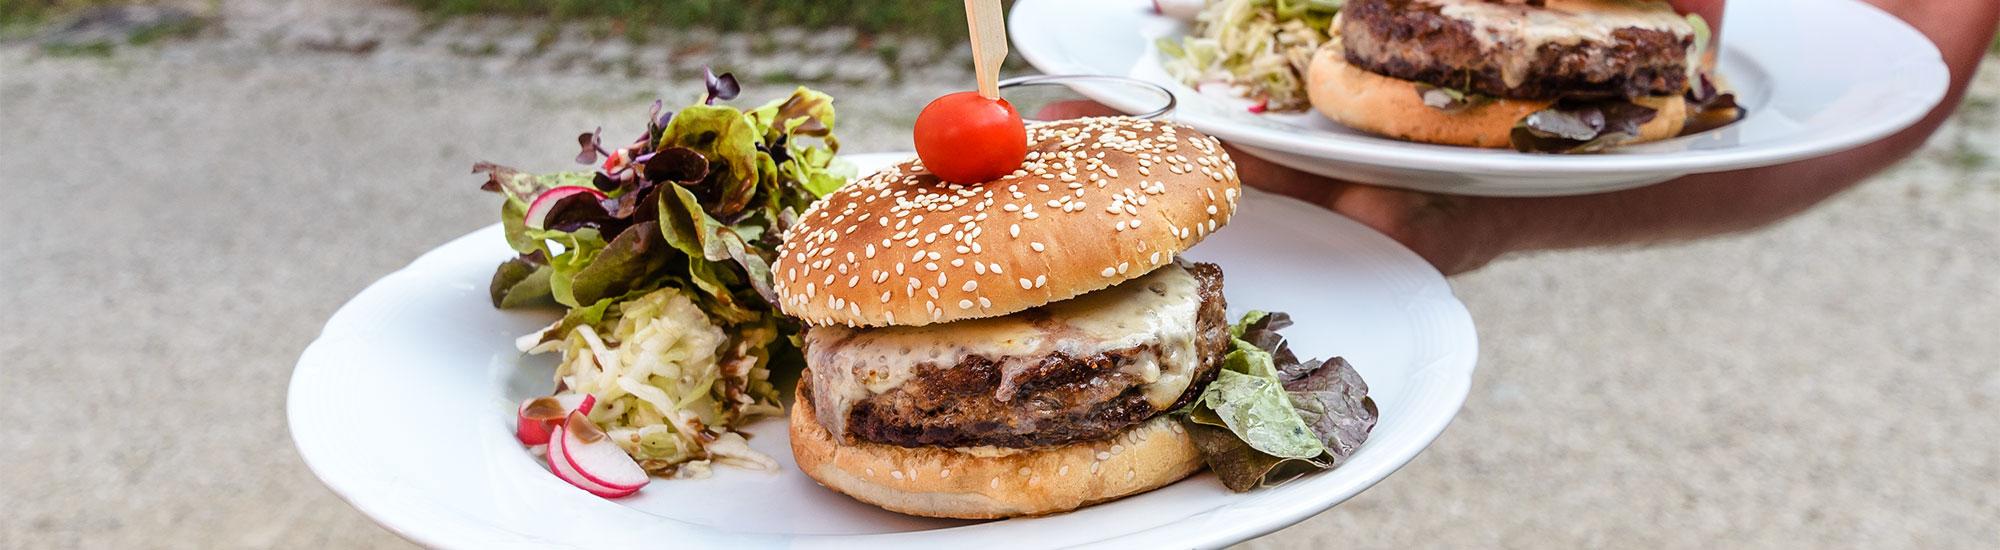 Burger-im-Biergarten